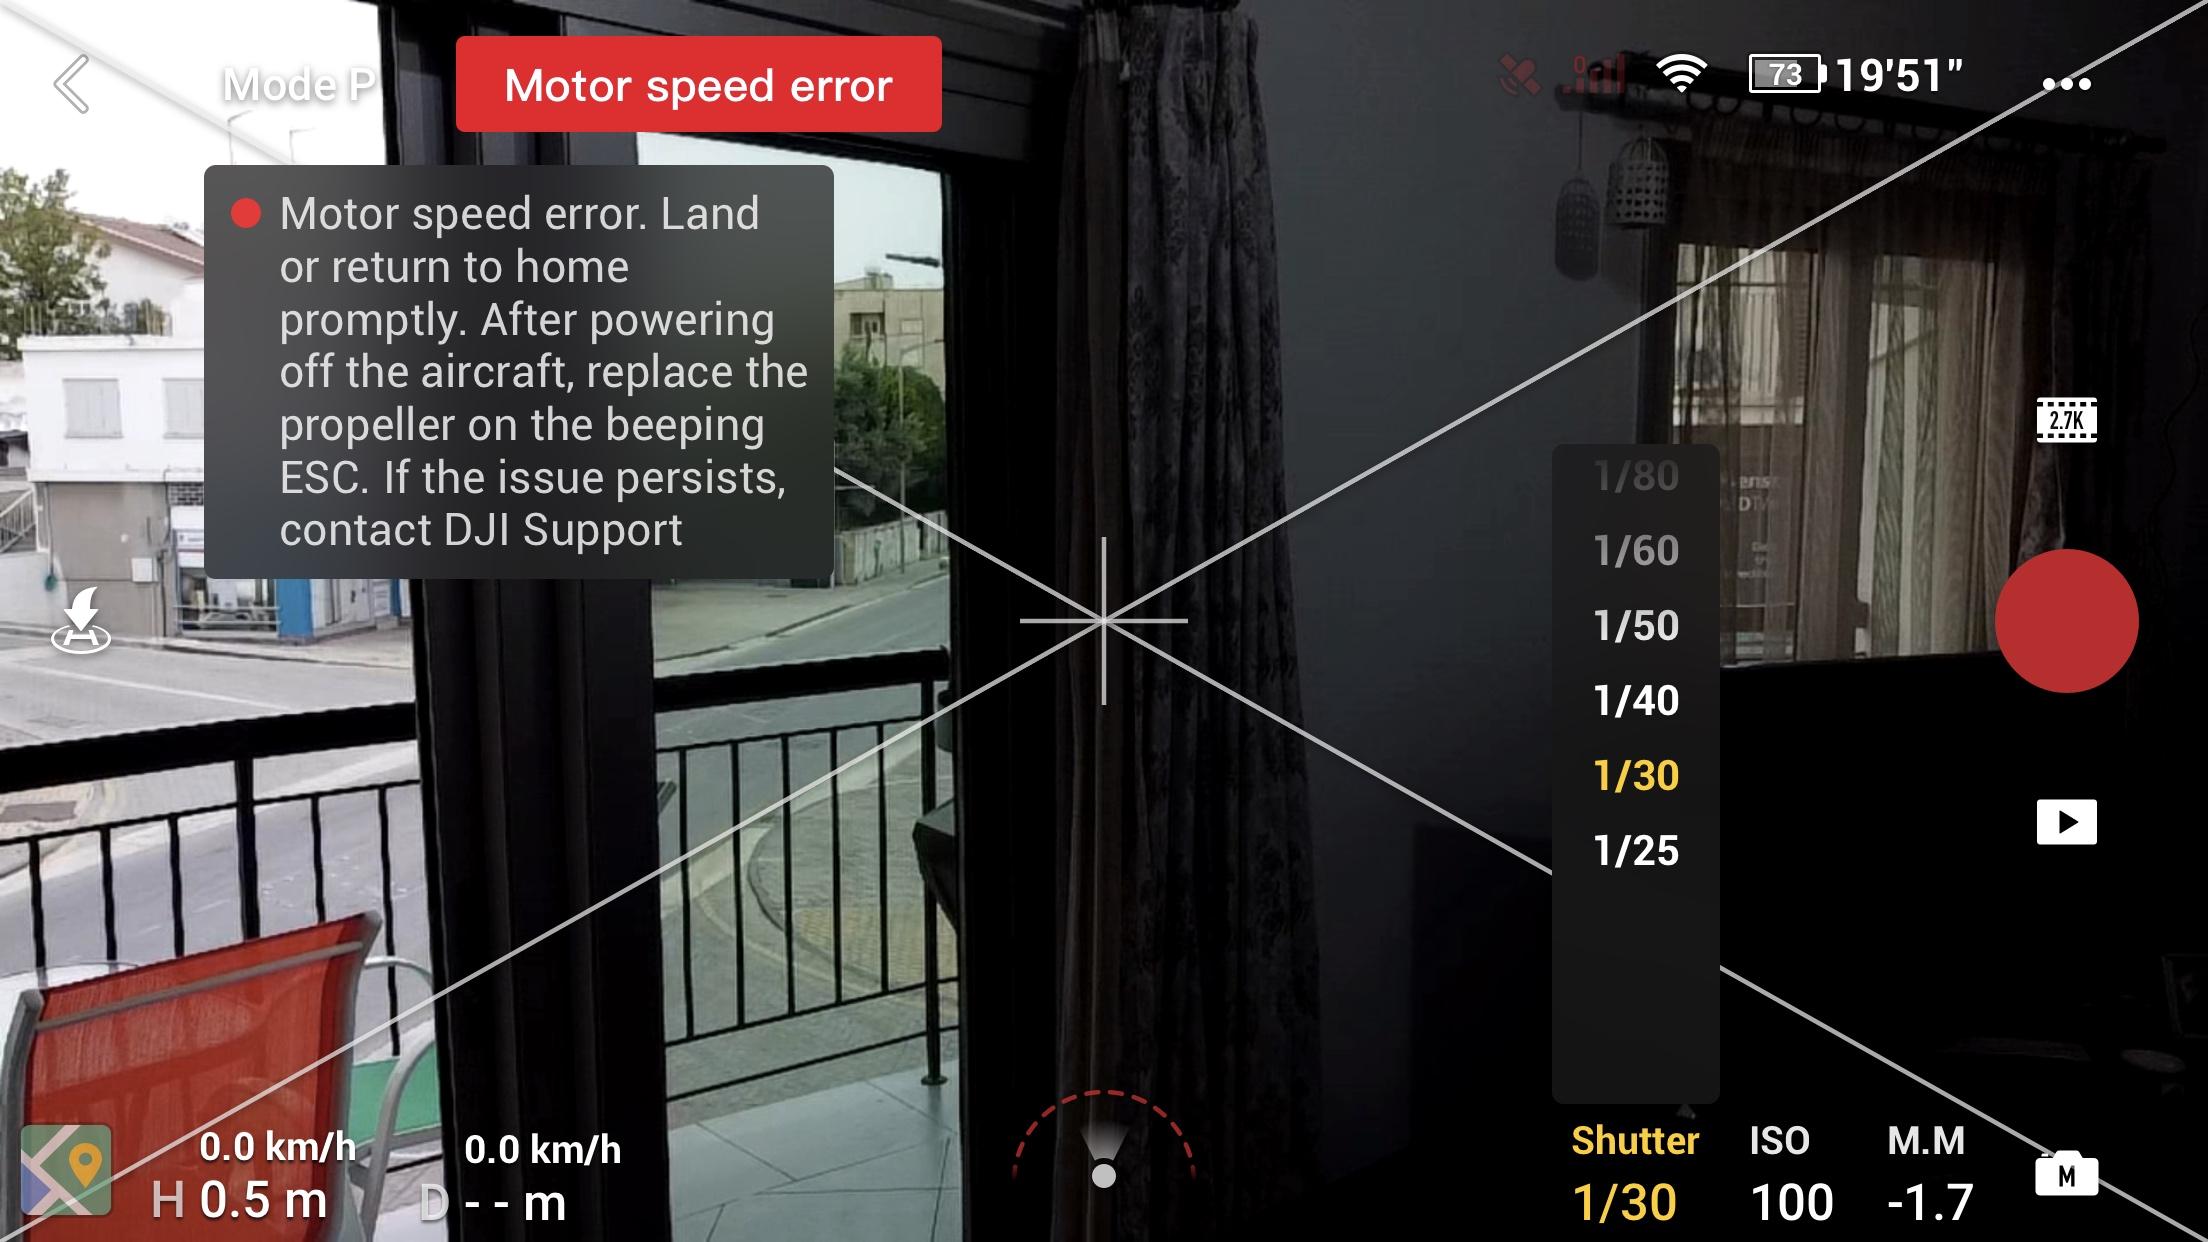 MOTOR SPEED ERROR